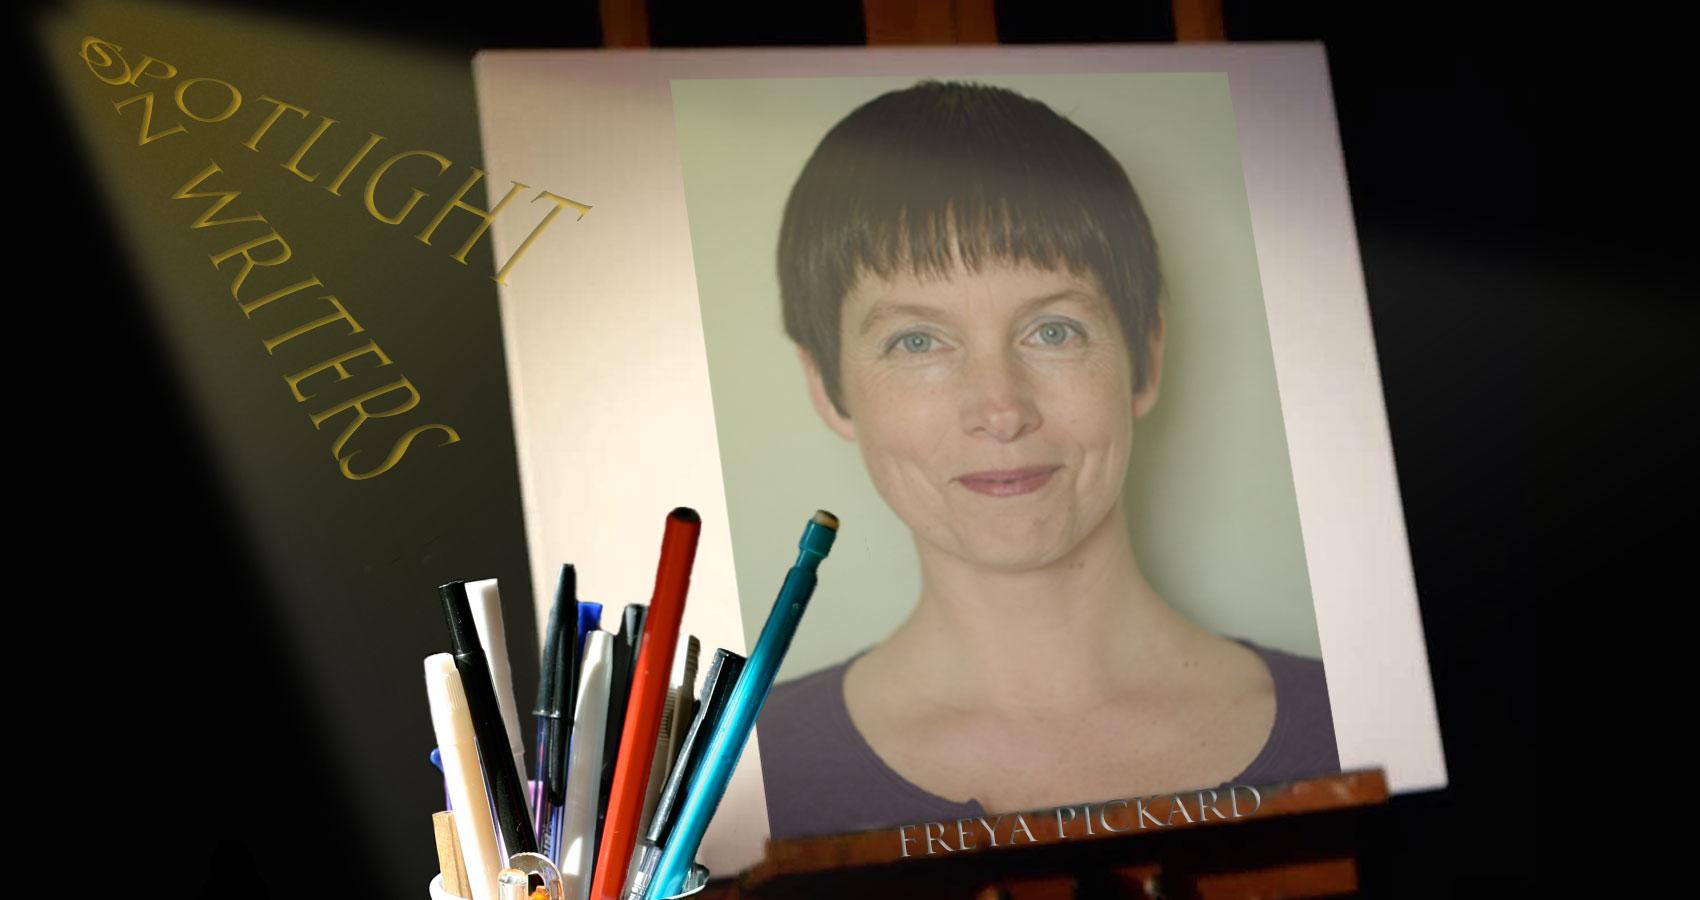 Spotlight On Writers - Freya Pickard at Spillwords.com